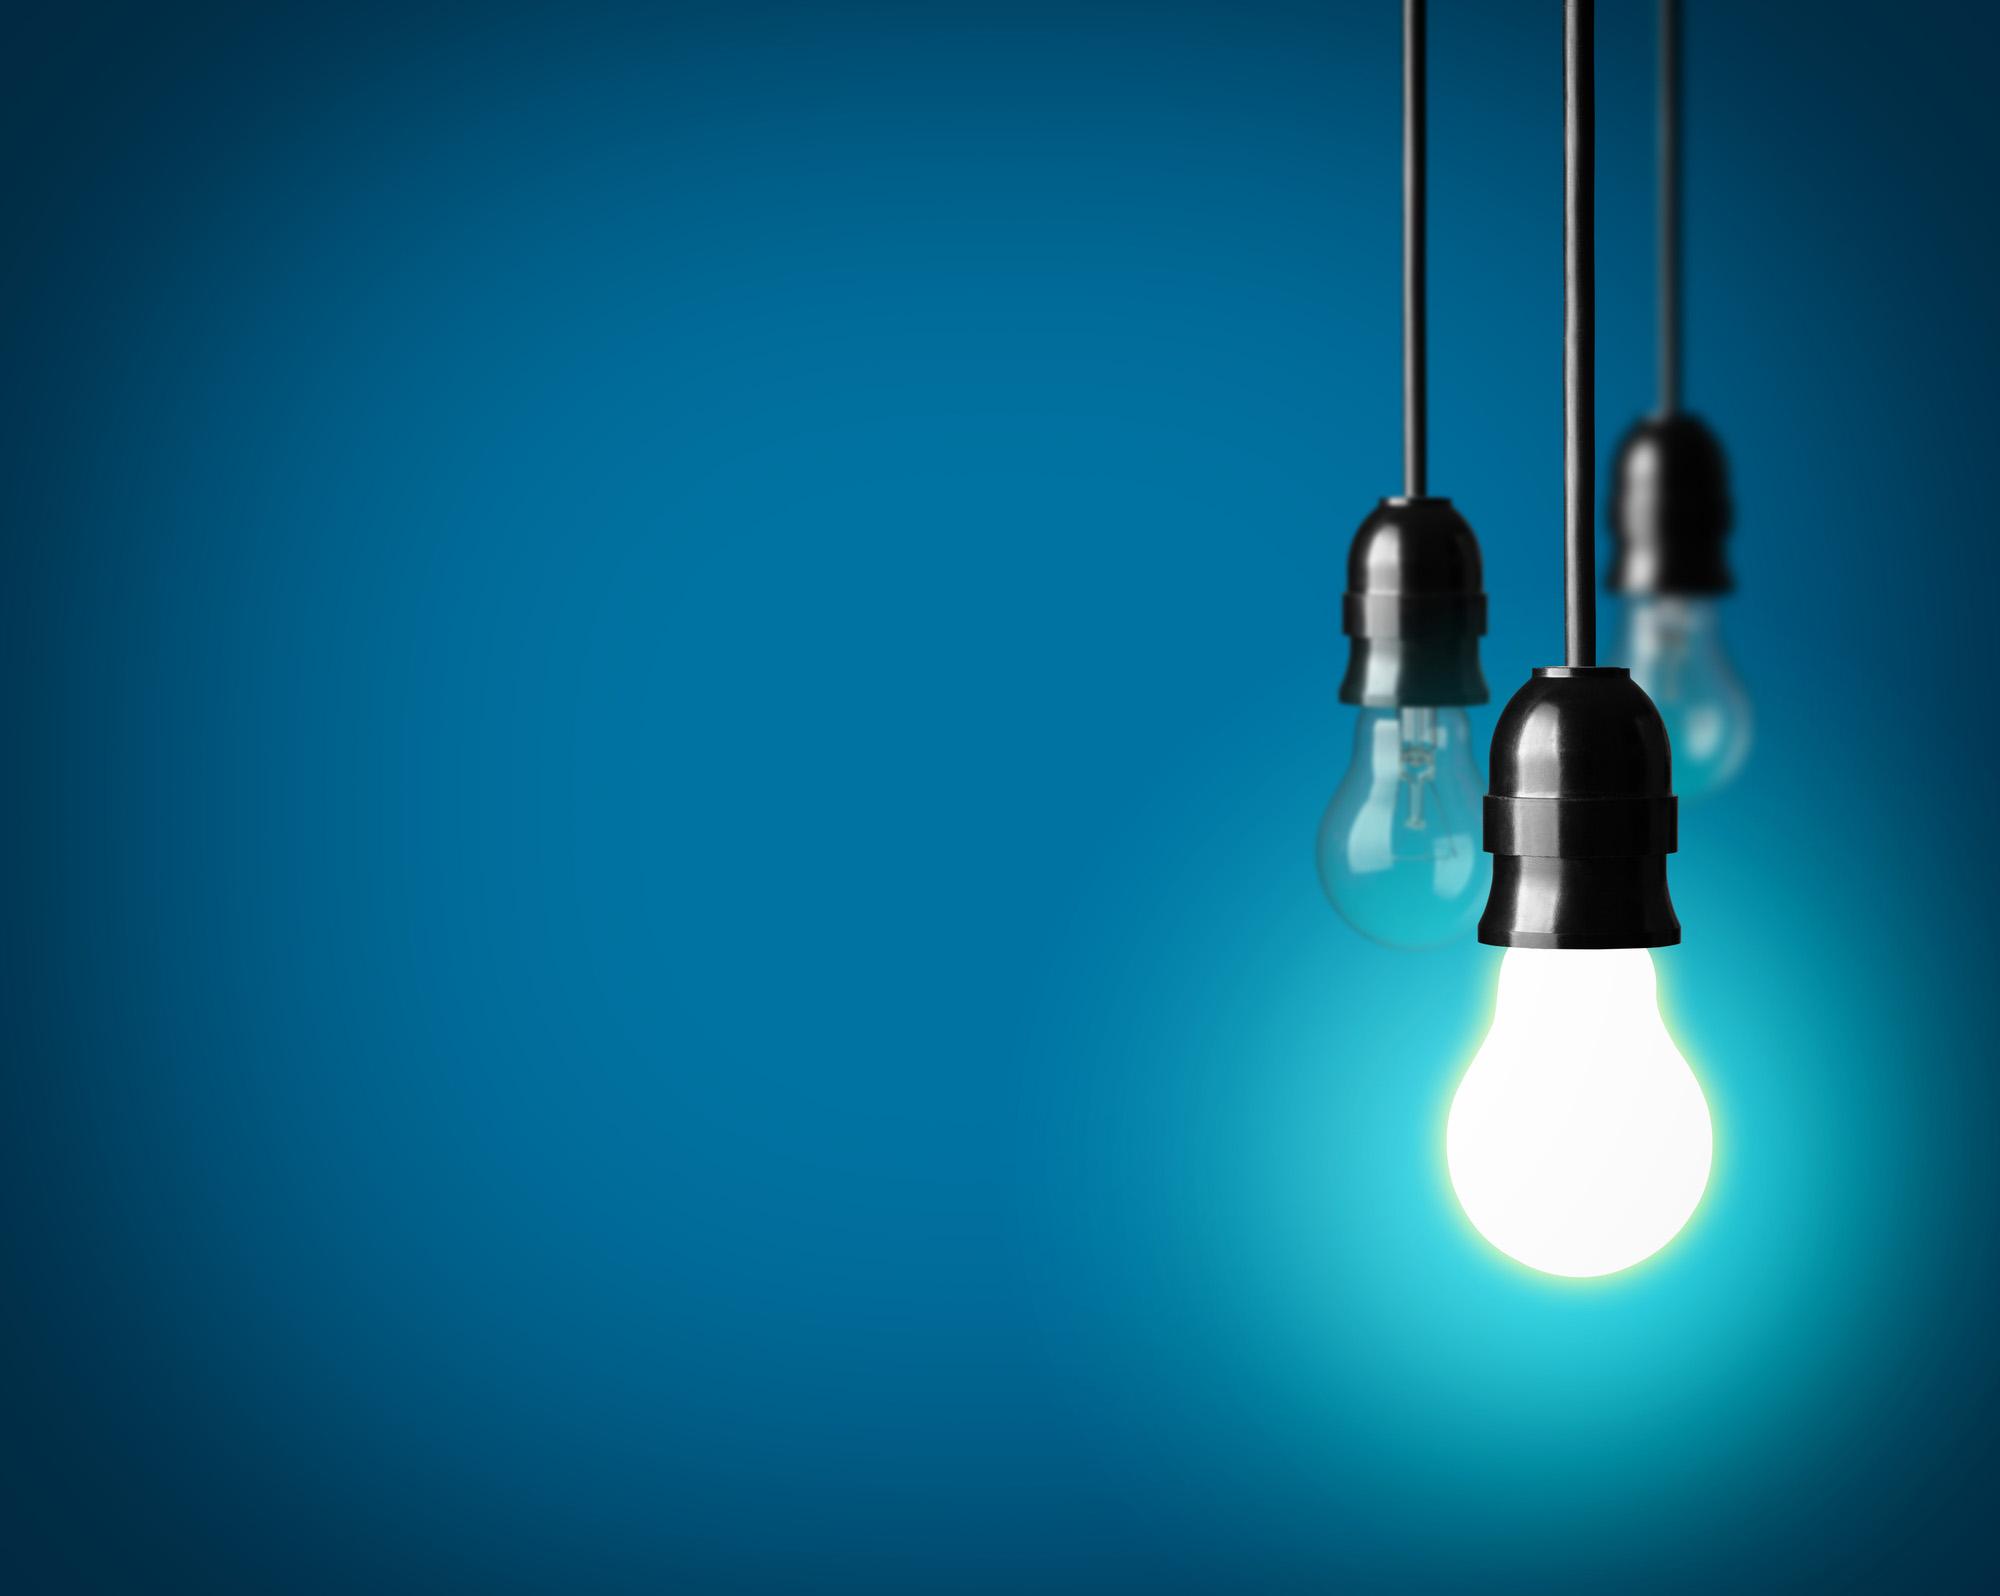 Light bulbs-72 ppi